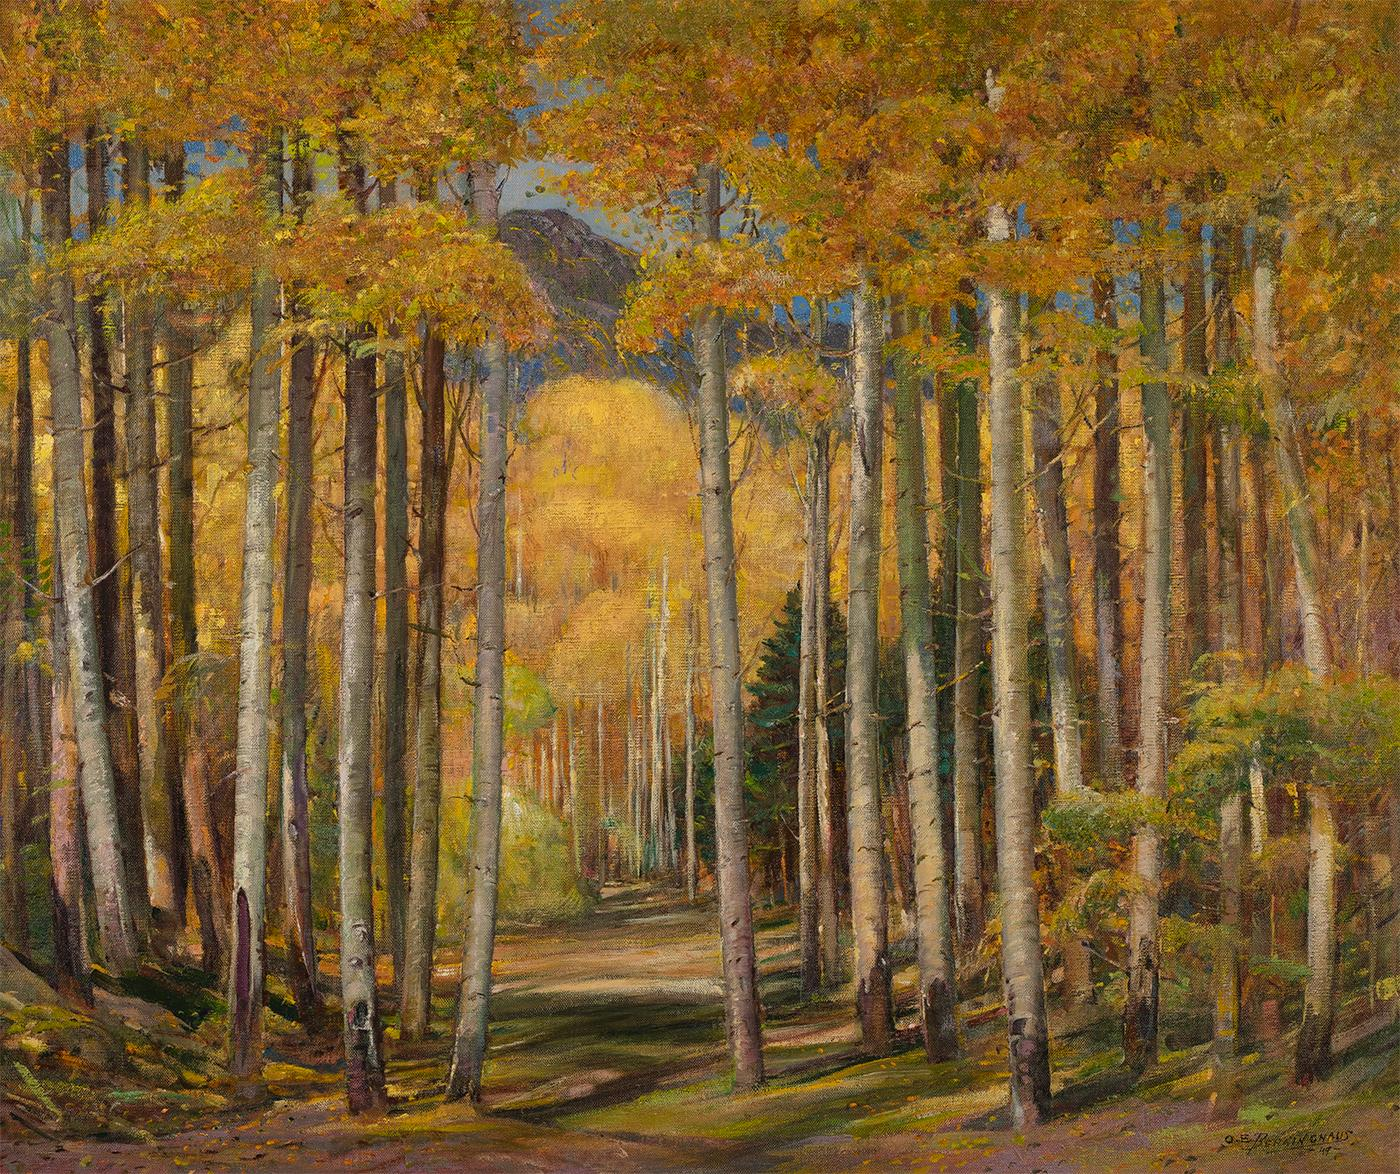 Autumn Aspen Forest